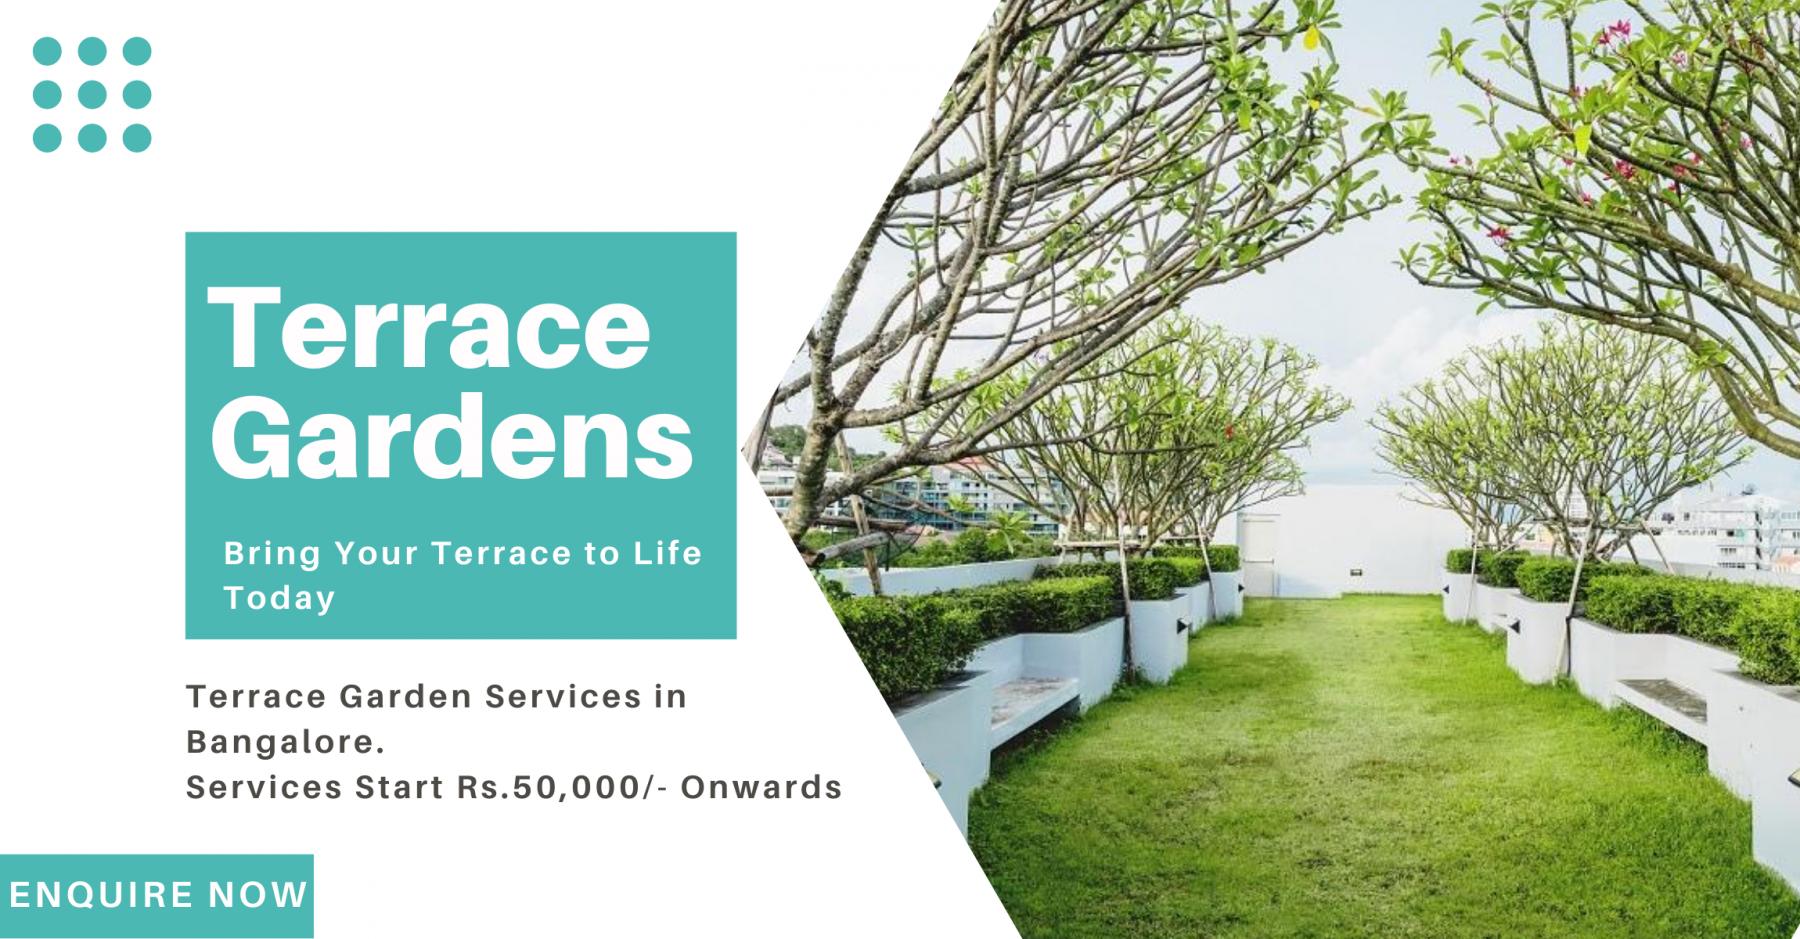 Terrace gardens bangalore